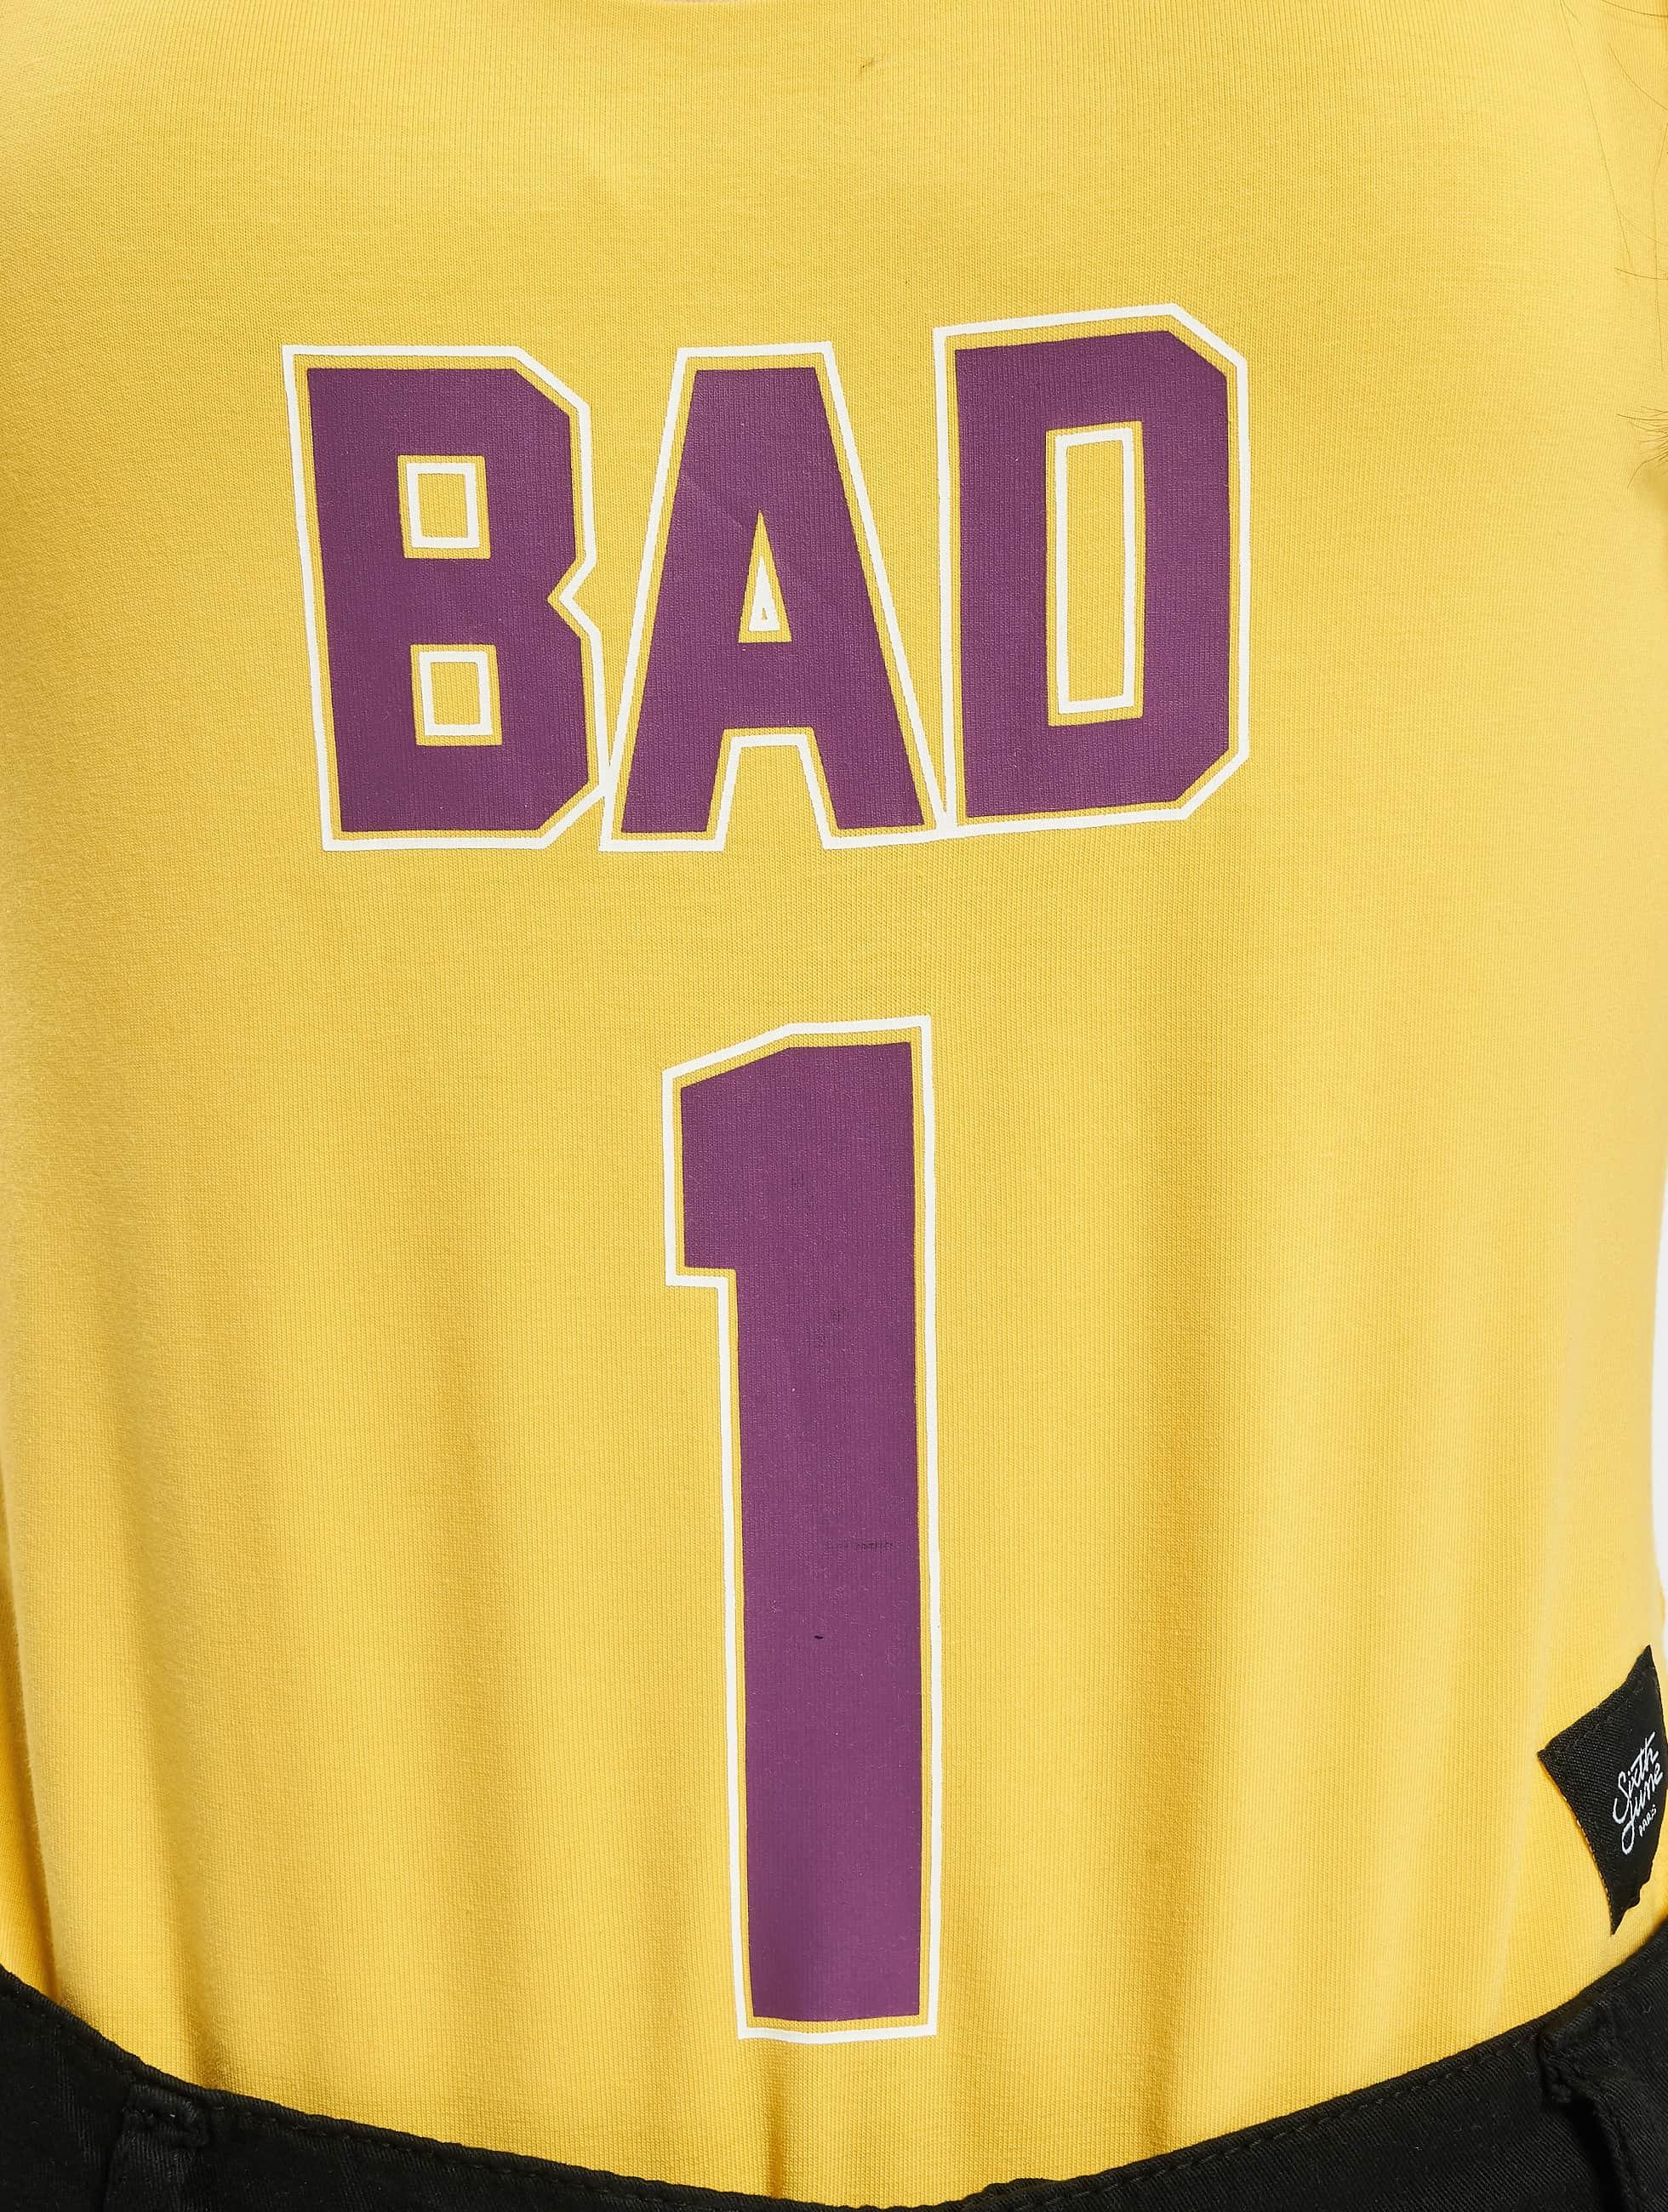 Sixth June Body Bad amarillo